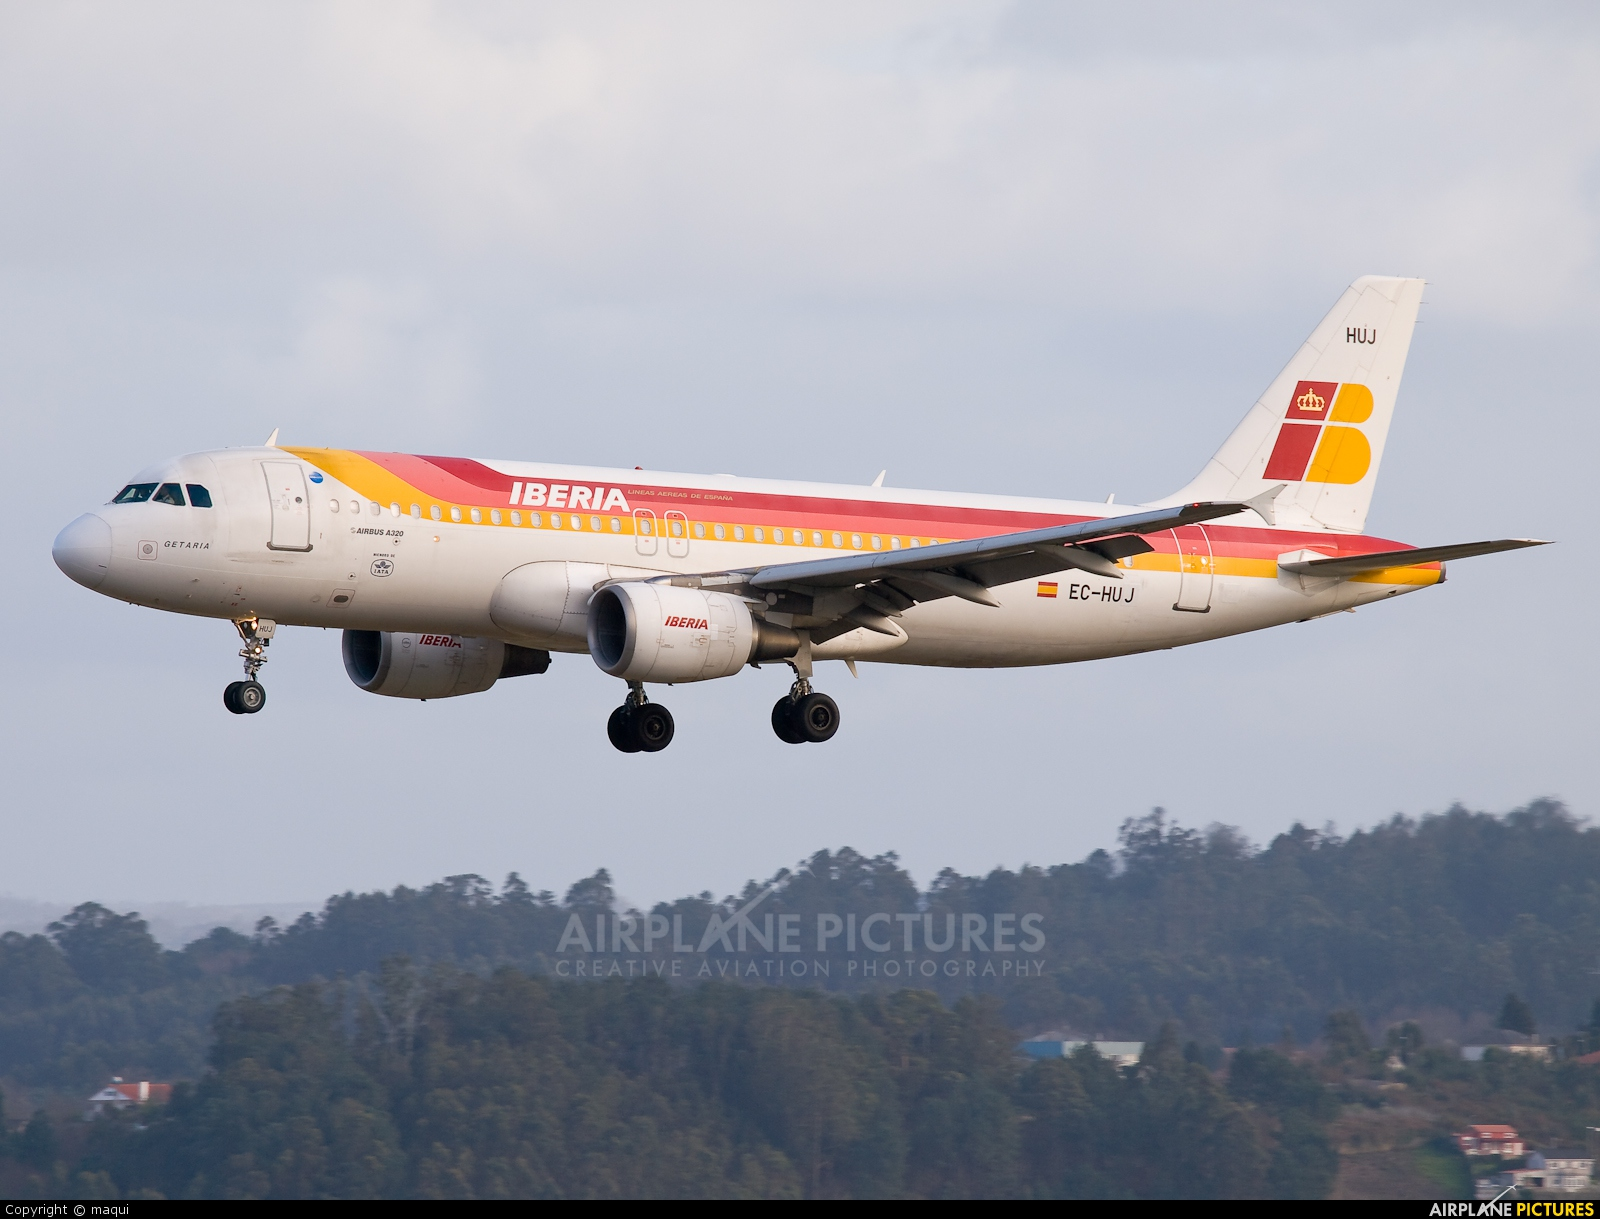 EC-HUJ - Iberia Airbus A320 at La Coruña | Photo ID 212969 ...